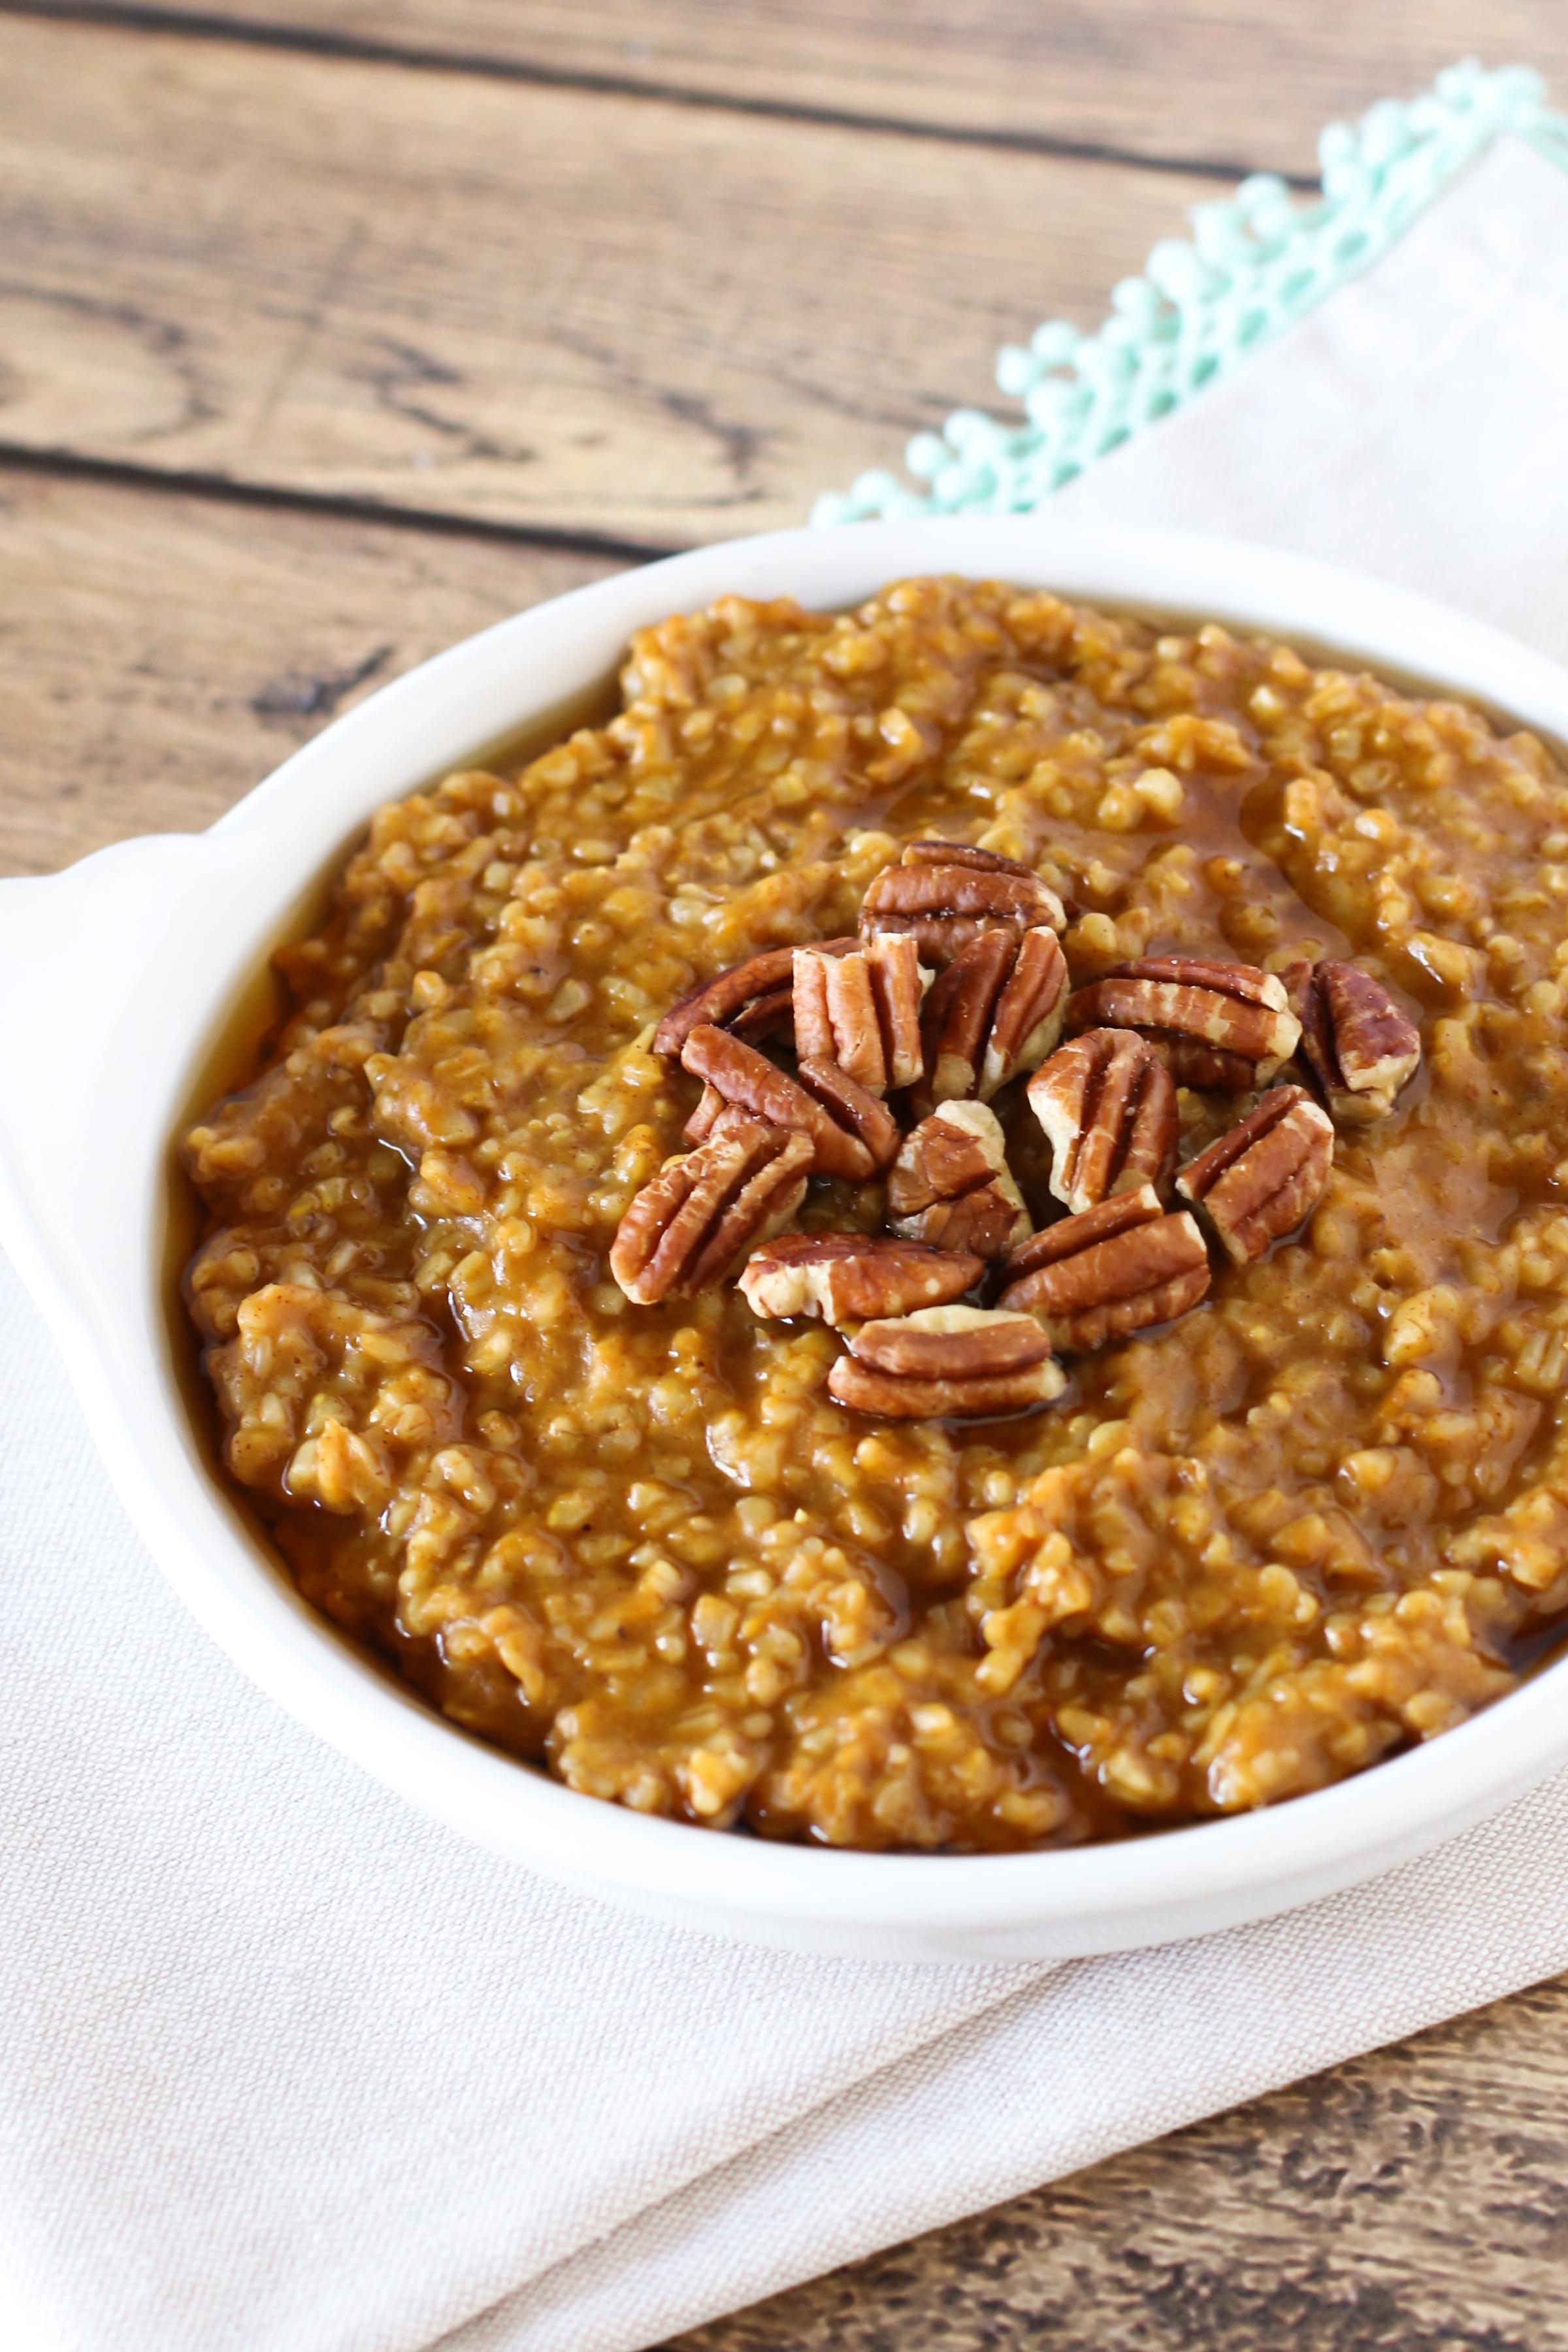 Gluten Free Vegan Pumpkin Pie Oatmeal. Creamy steel cut oats, with pumpkin, spice and everything nice.